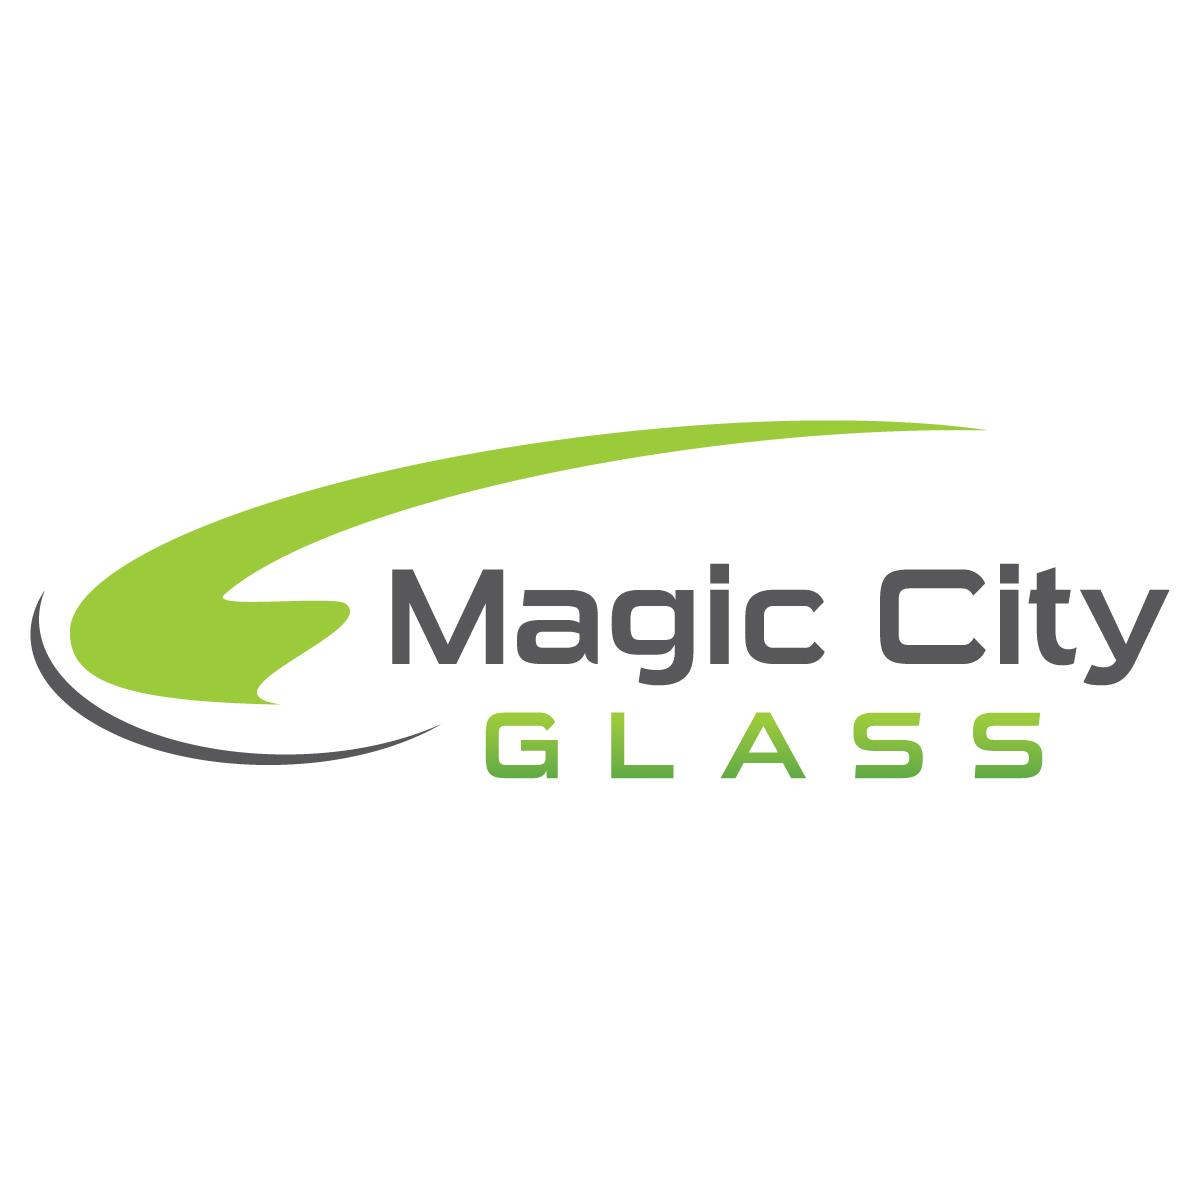 Magic City Glass image 16